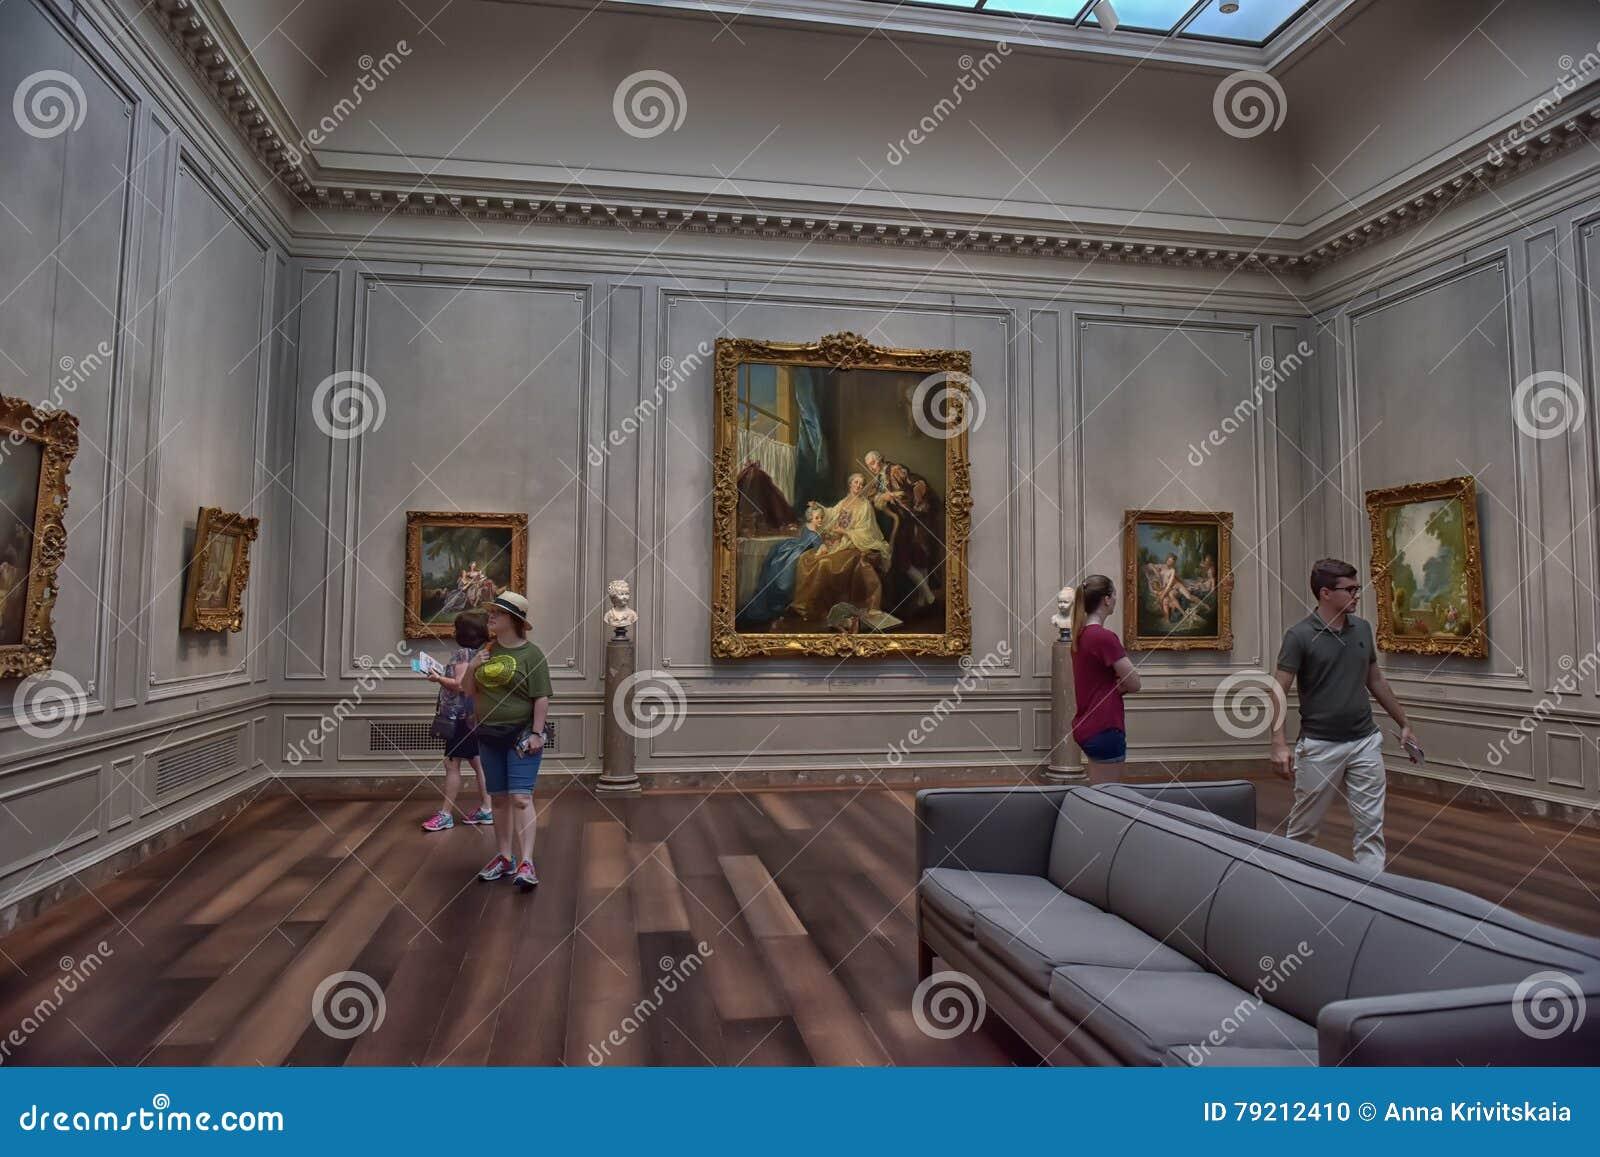 National Gallery, Washington